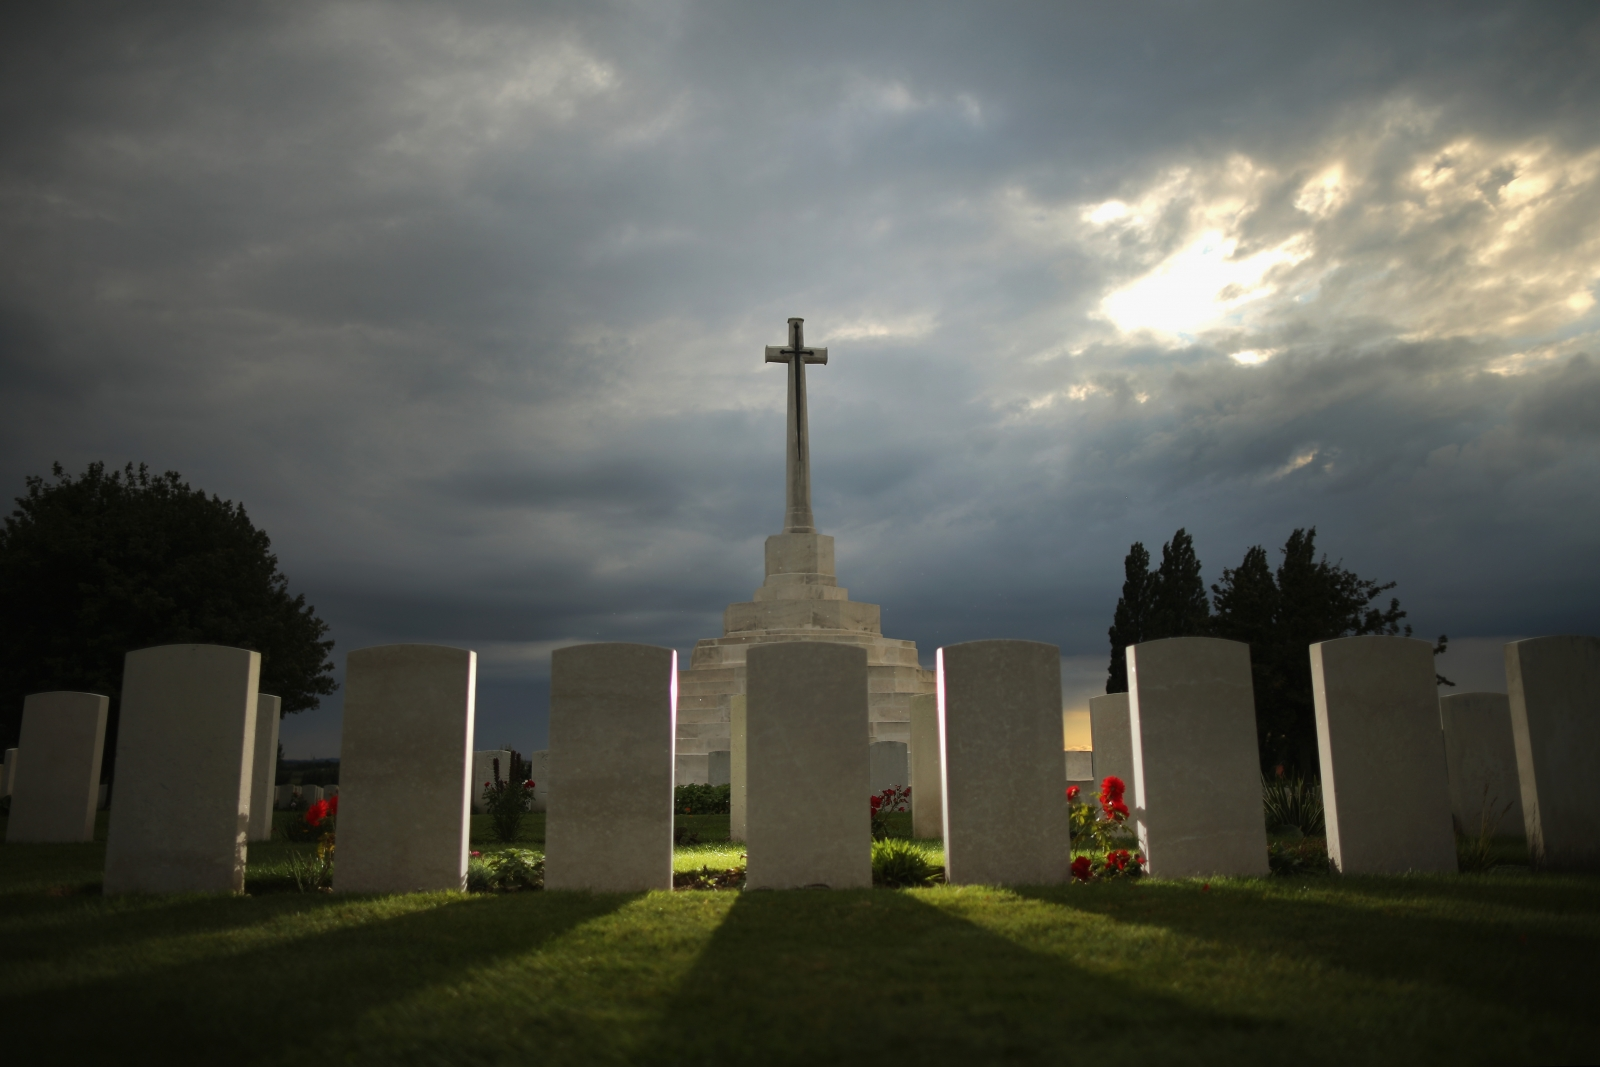 WW1 The Cross of Sacrifice